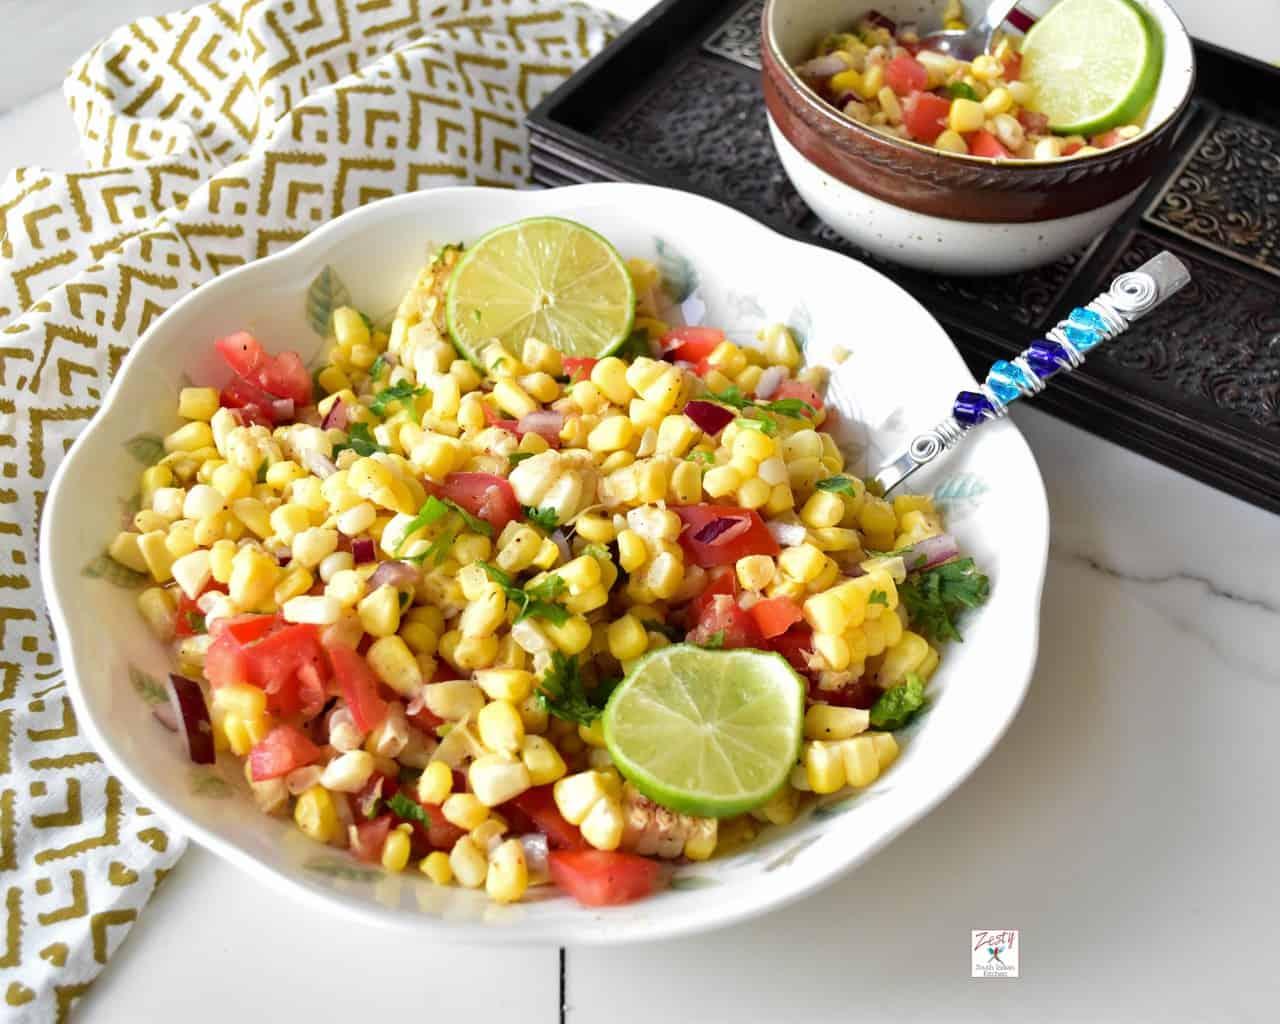 "<img src=""https://cdn.shortpixel.ai/client/q_glossy,ret_img,w_3412,h_2730/Corn chaat.jpg"" alt="" corn chaat a boiled corn salad "">"